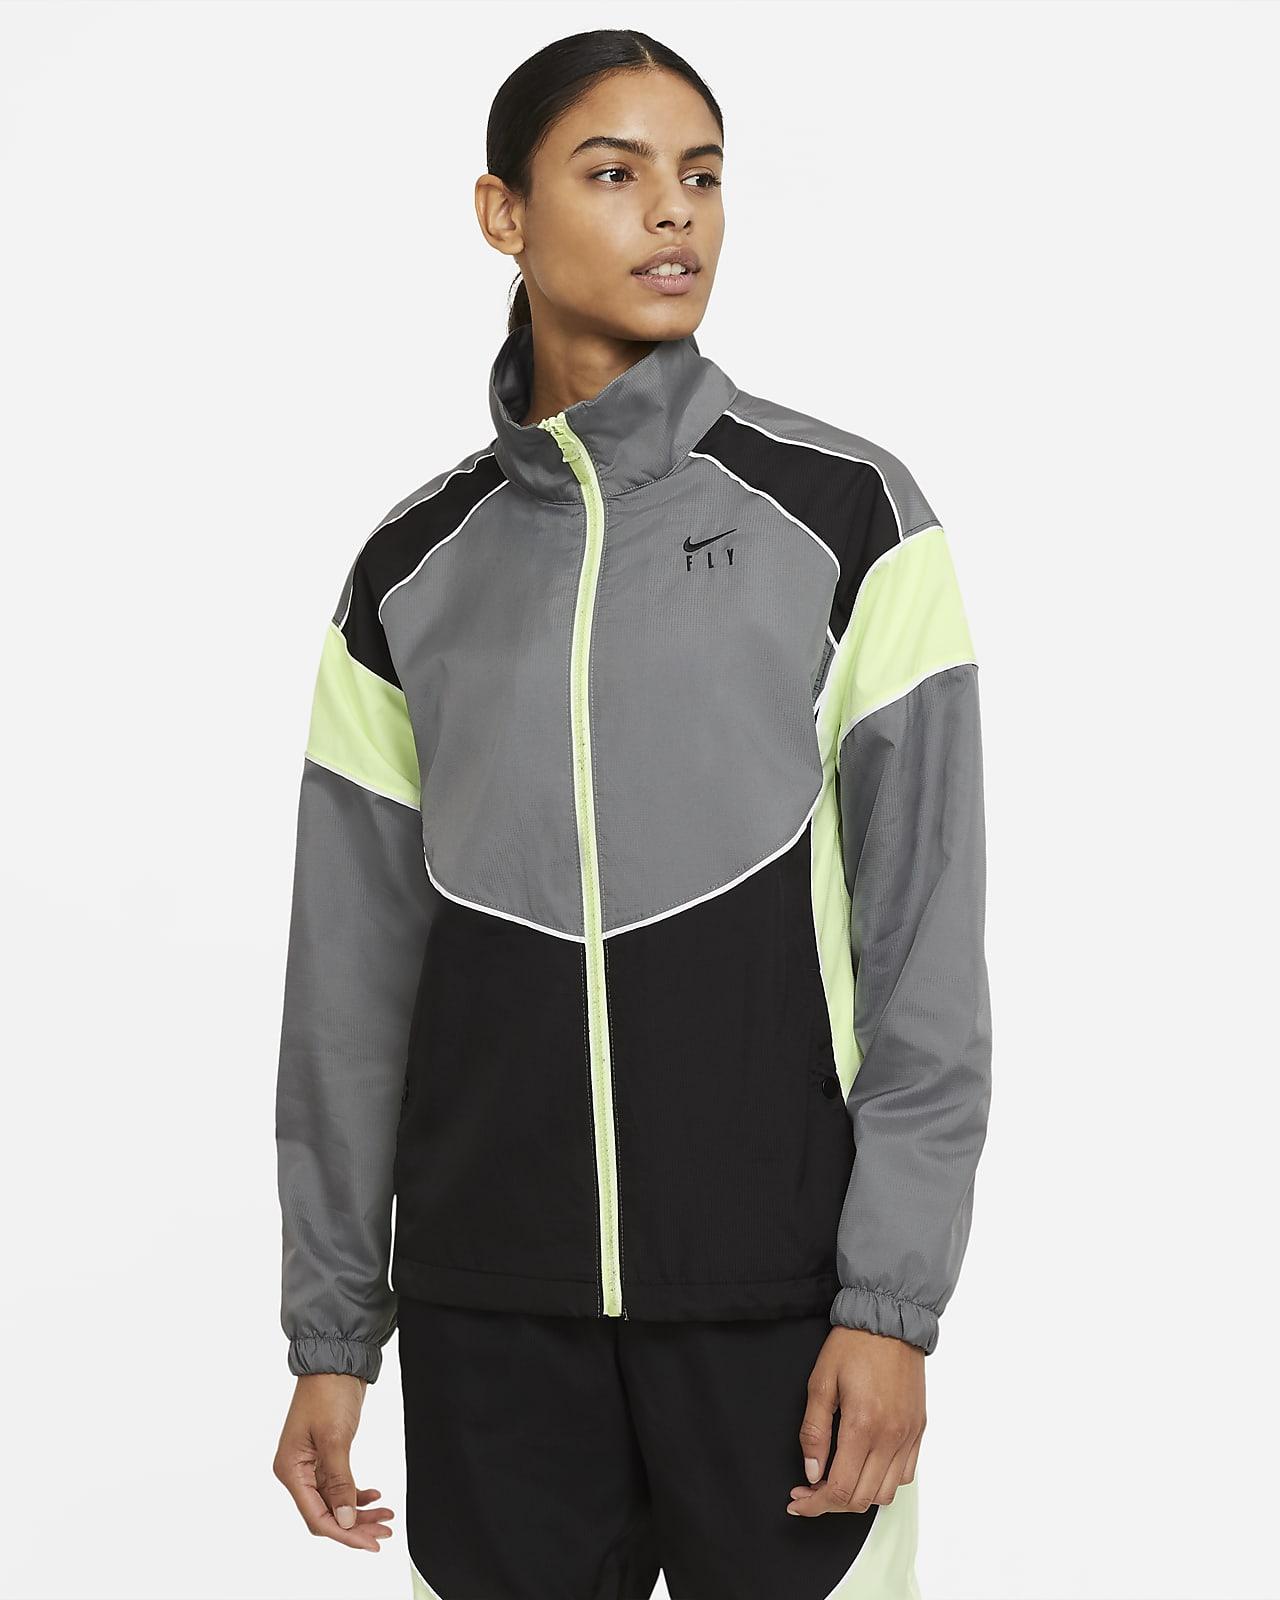 Nike Swoosh Fly Women's Basketball Jacket